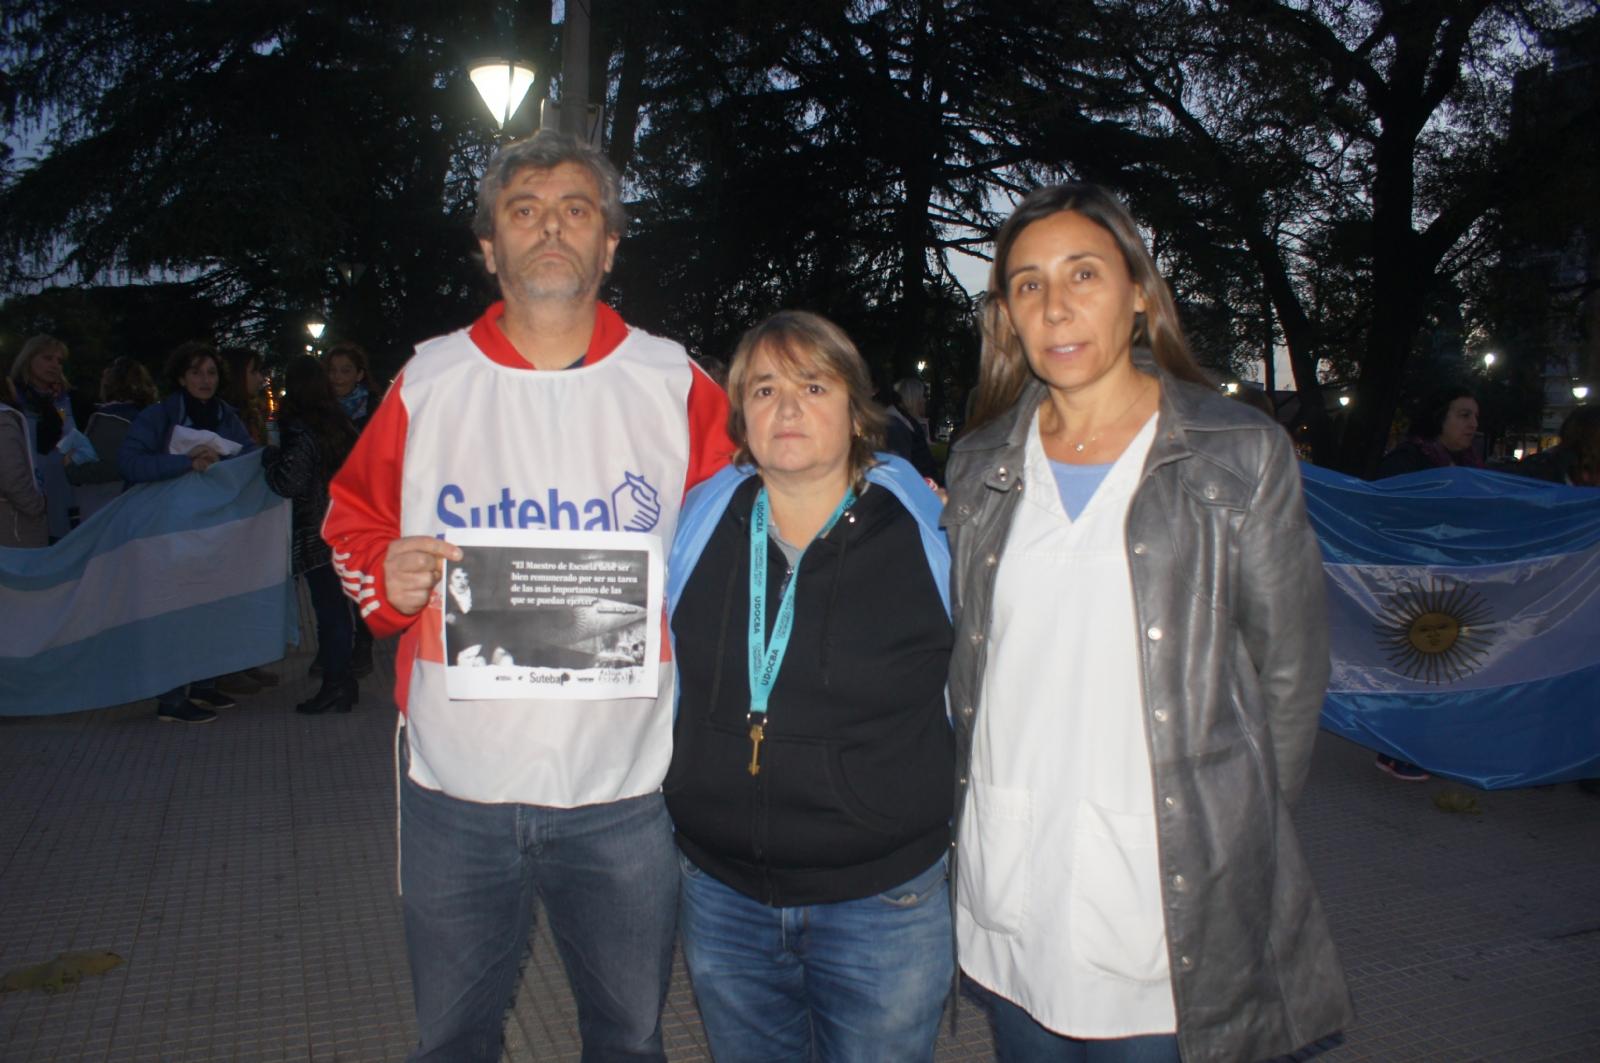 La Justicia ordenó a Vidal que convoque la paritaria docente — Exclusivo PERFIL